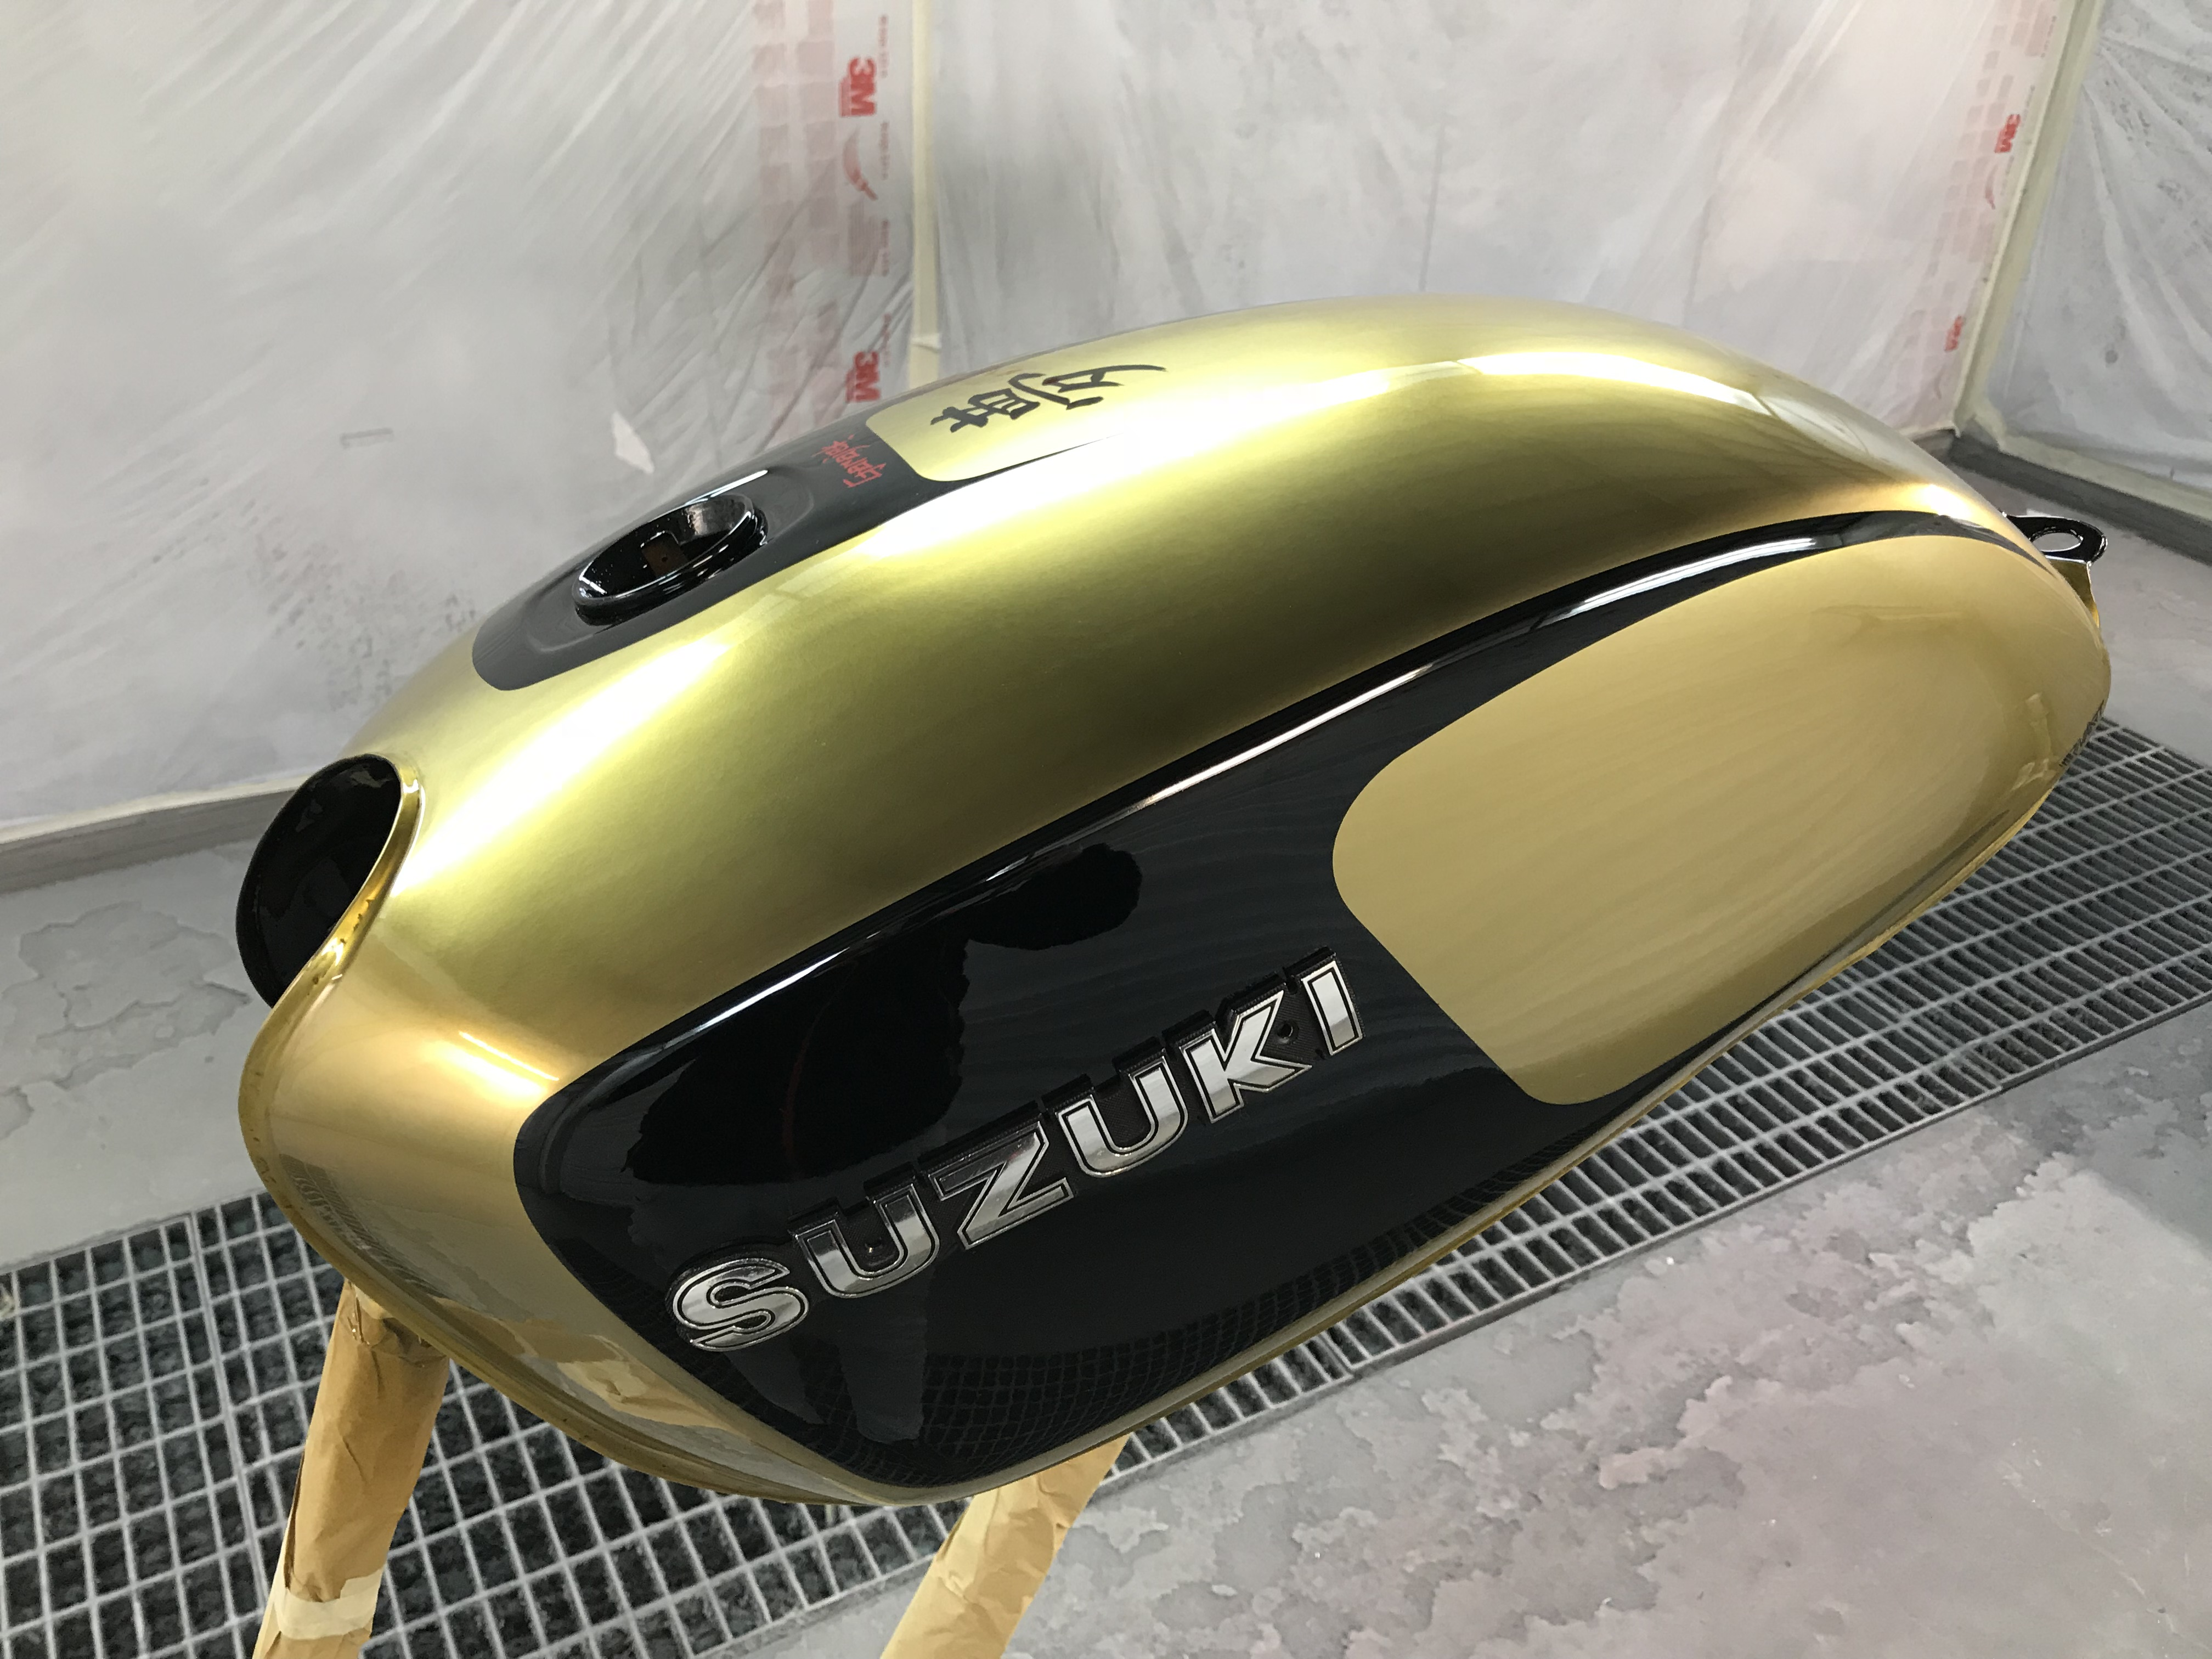 Suzuki Cafè Racer by GARAJEK